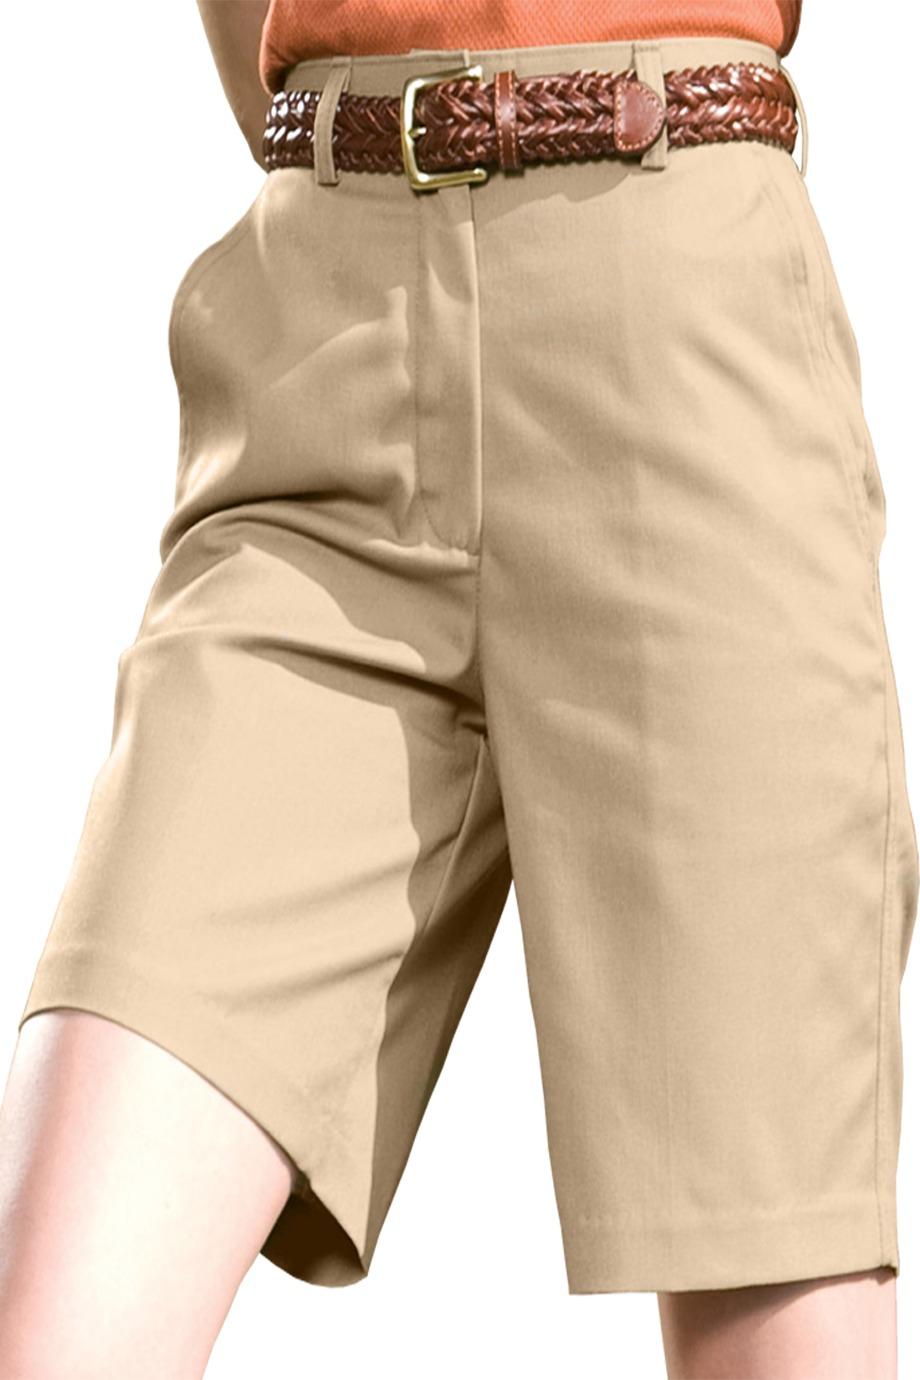 Edwards Garment 8459 - Women's Flat Front Short